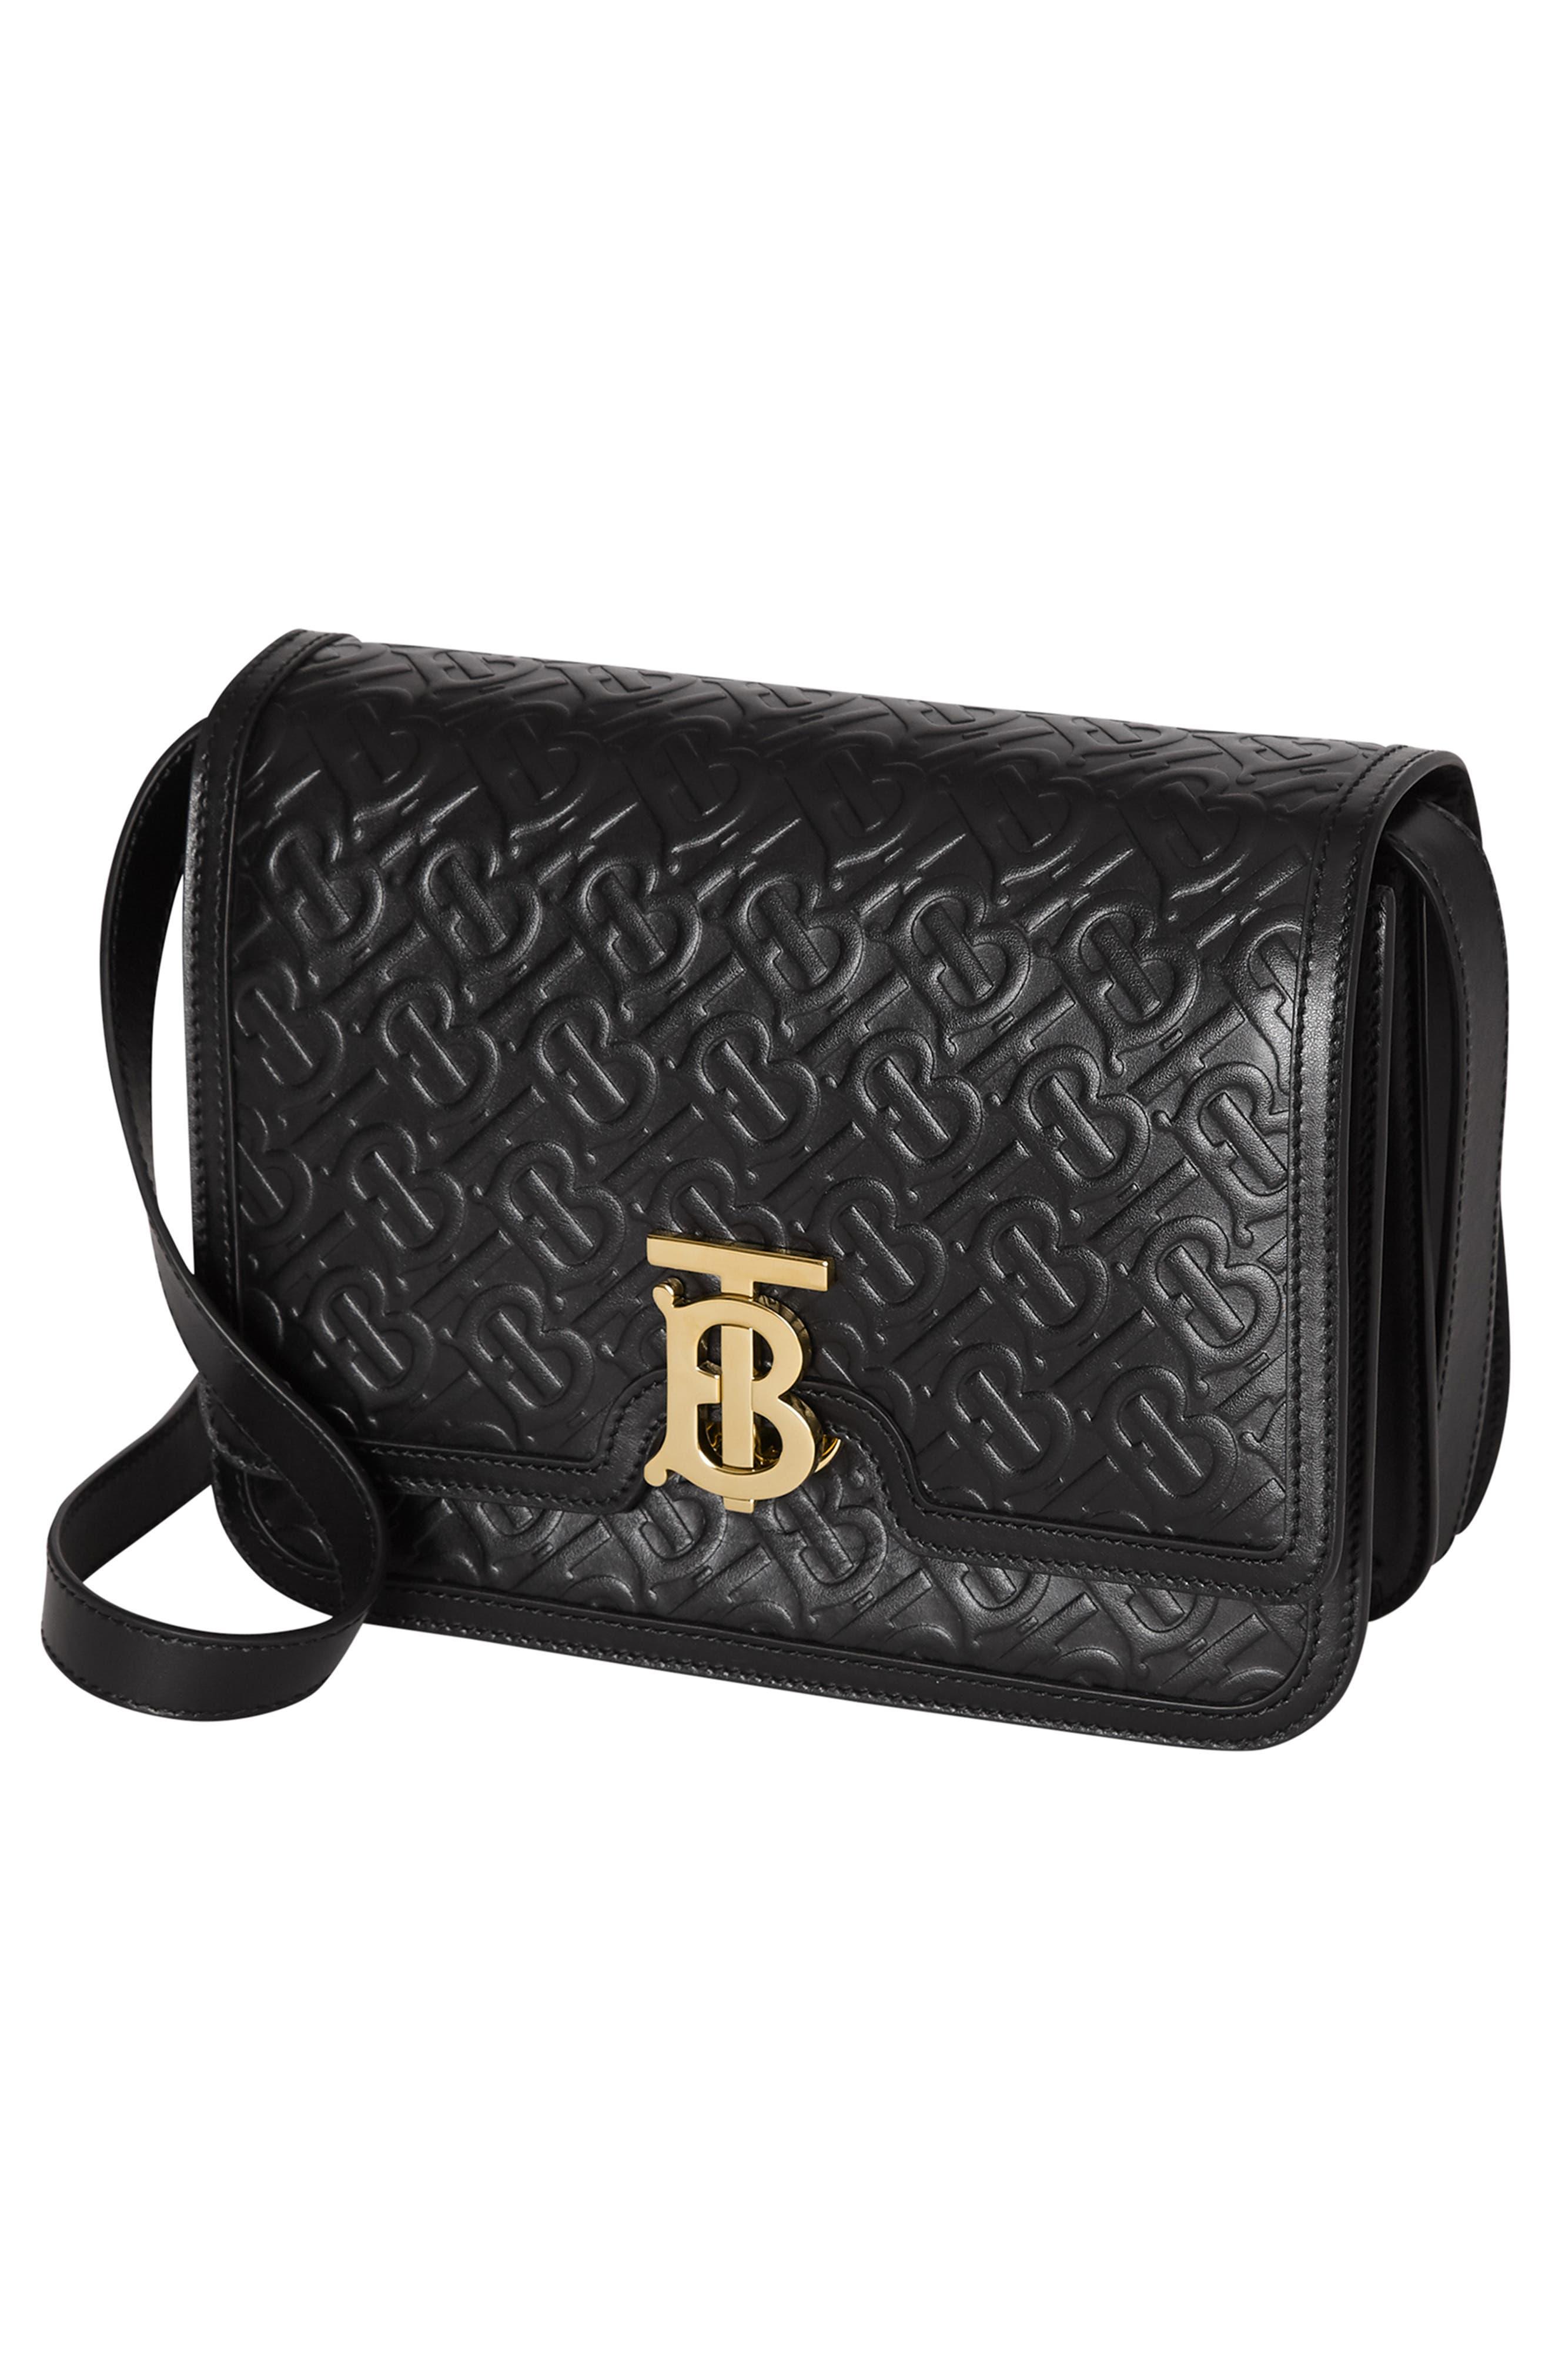 BURBERRY, Medium TB Monogram Leather Bag, Alternate thumbnail 6, color, BLACK